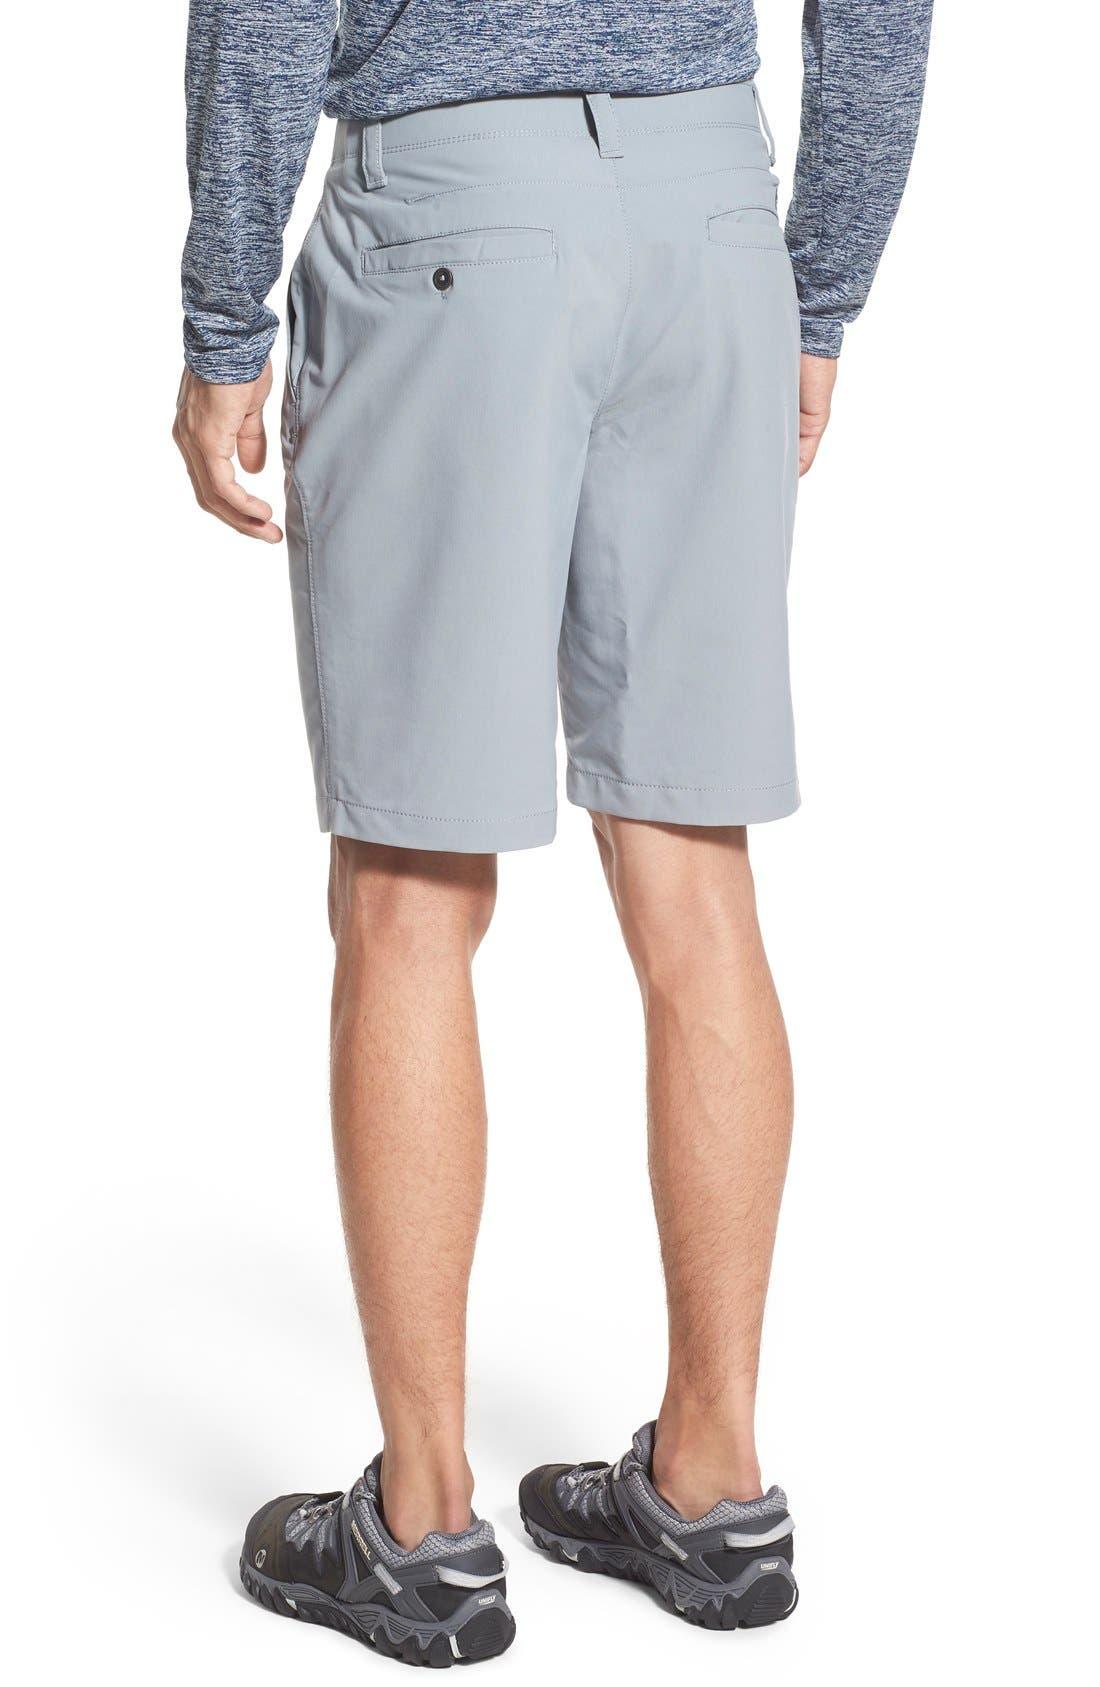 'Matchplay' Moisture Wicking Golf Shorts,                             Alternate thumbnail 4, color,                             035